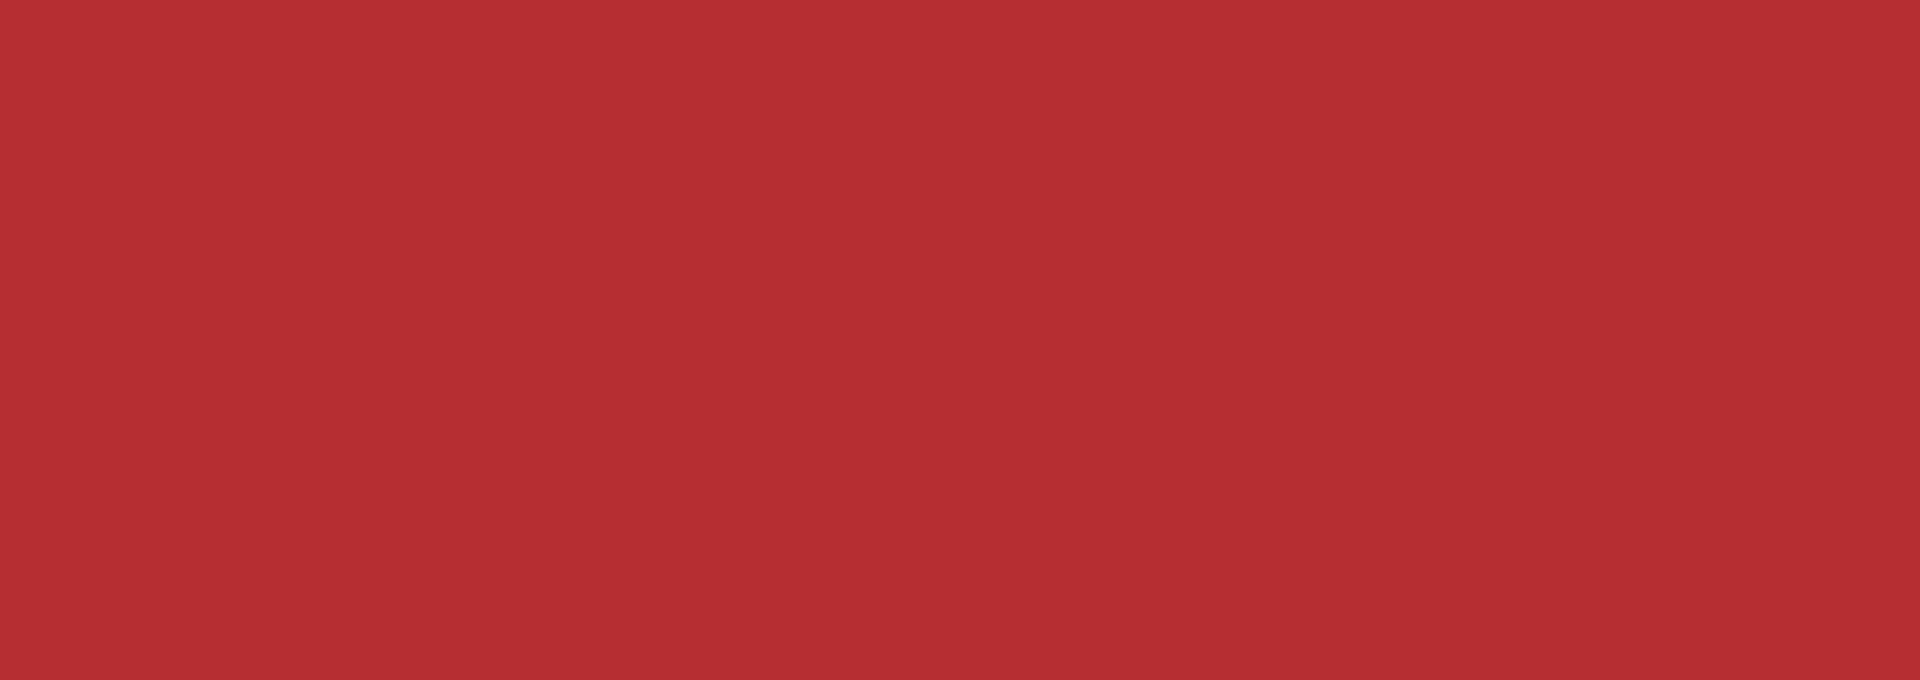 AngularJS Development Company | AngularJS Development Services